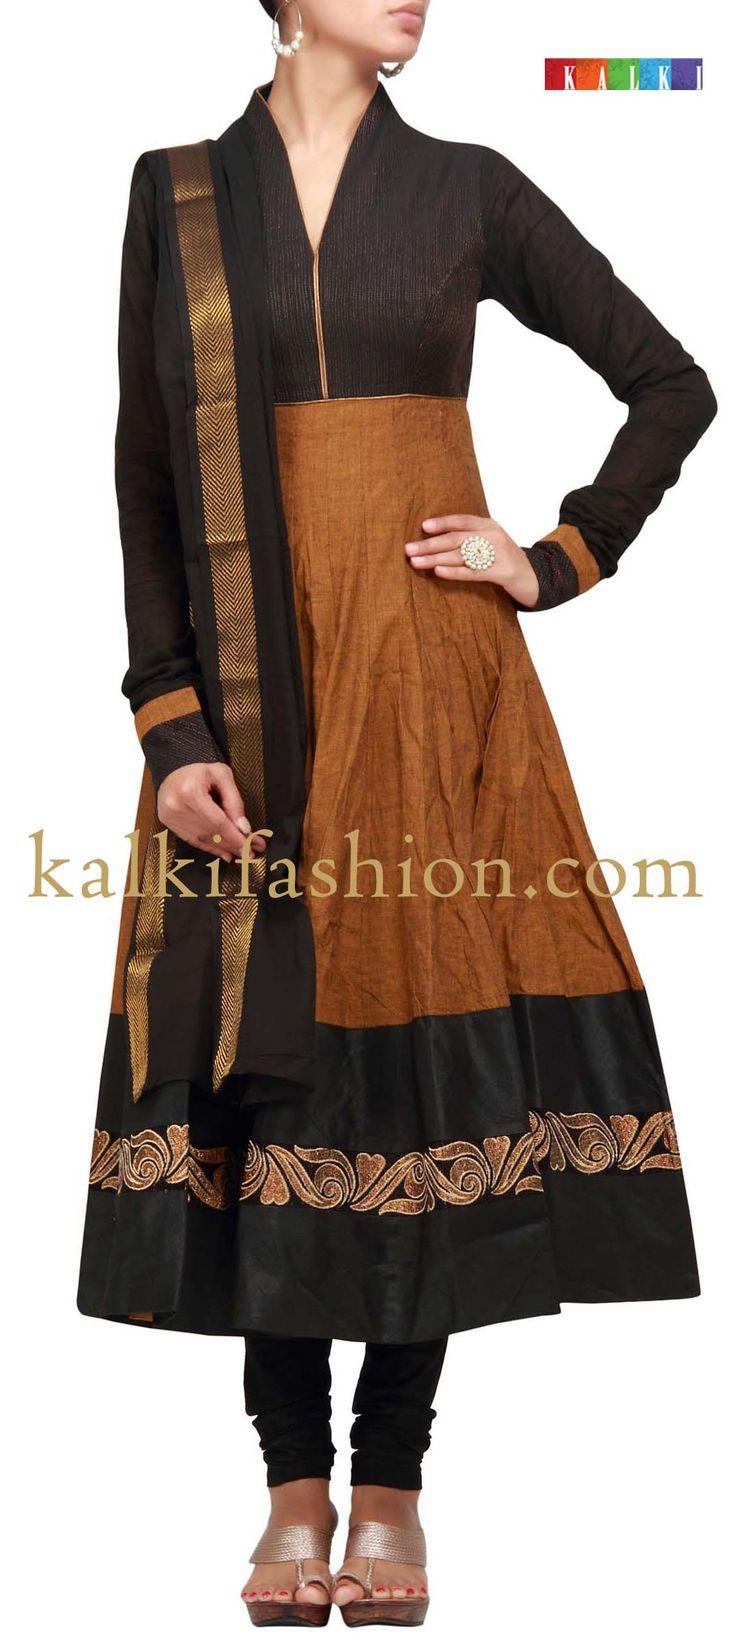 Buy it now  http://www.kalkifashion.com/anarkali-suit-in-brown-with-zari-work.html  Anarkali suit in brown with zari work